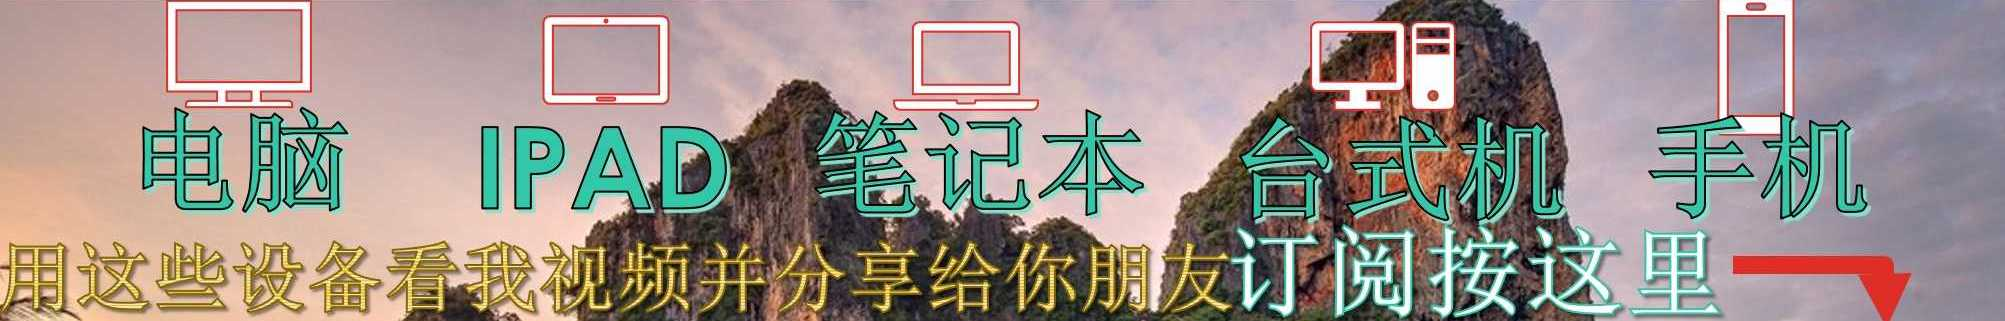 JK搞笑游戏解说 banner